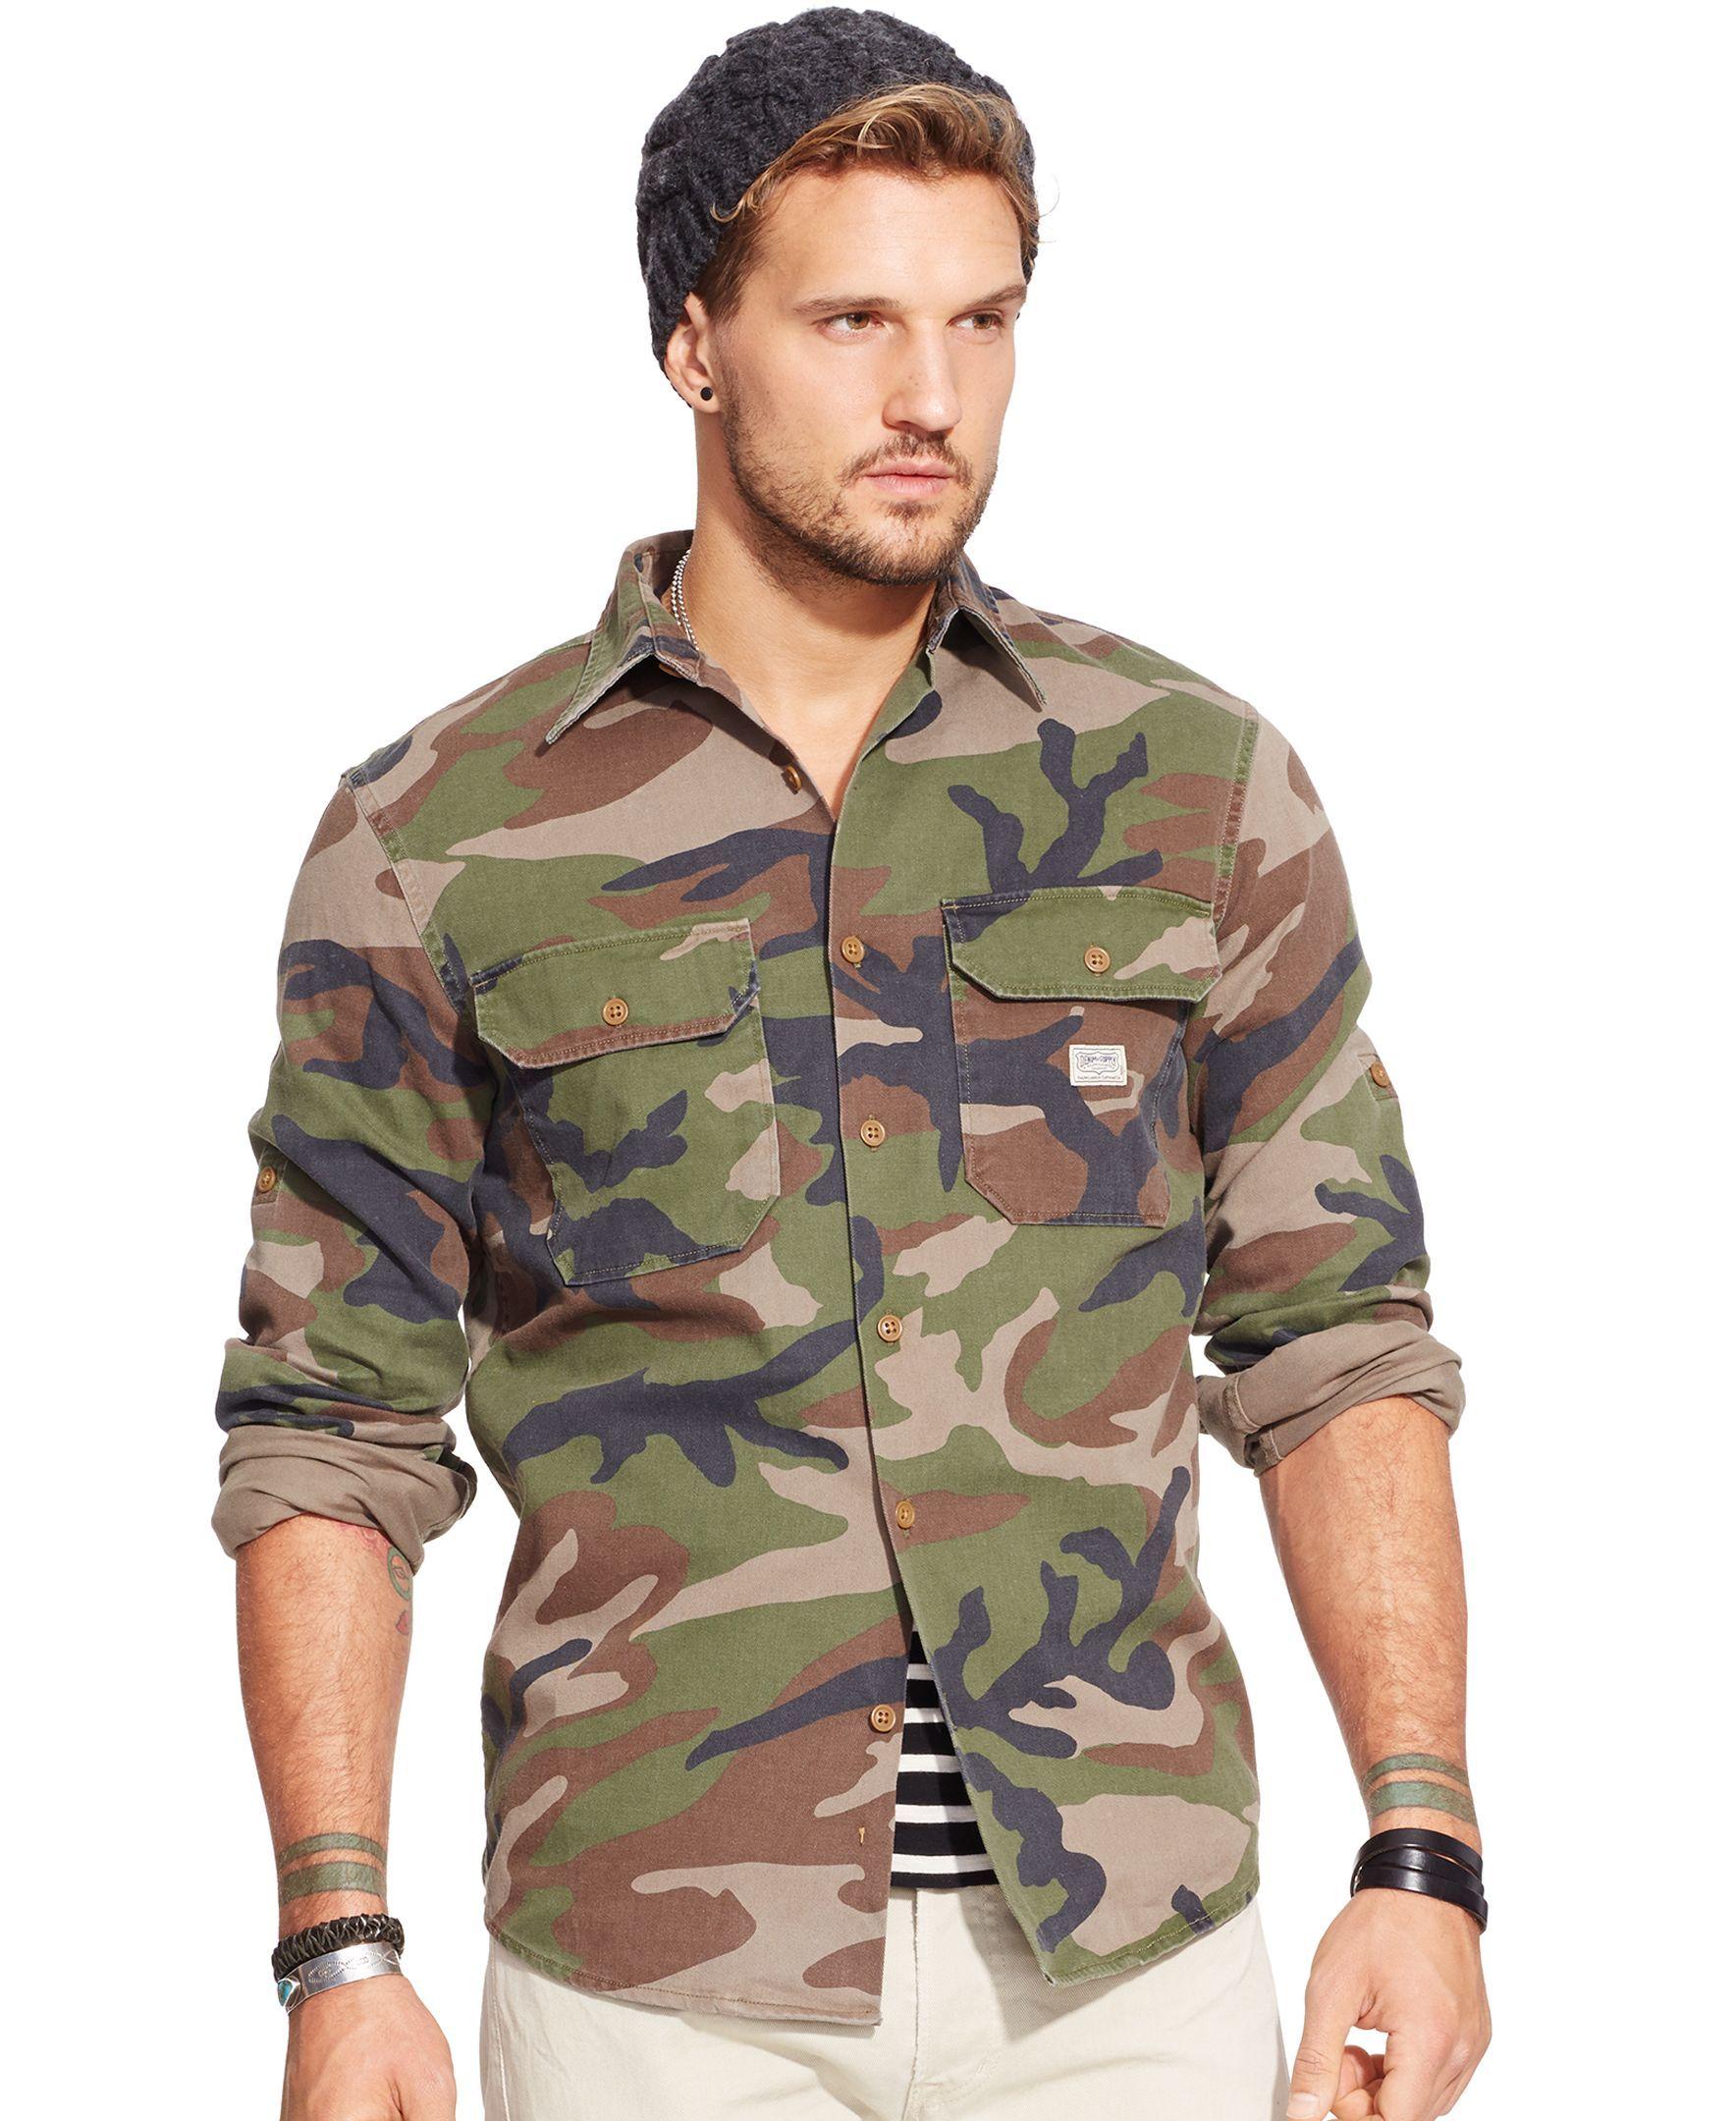 877dced3a6dfa Denim & Supply Ralph Lauren Camo Military Shirt | Fashiøn in 2019 ...